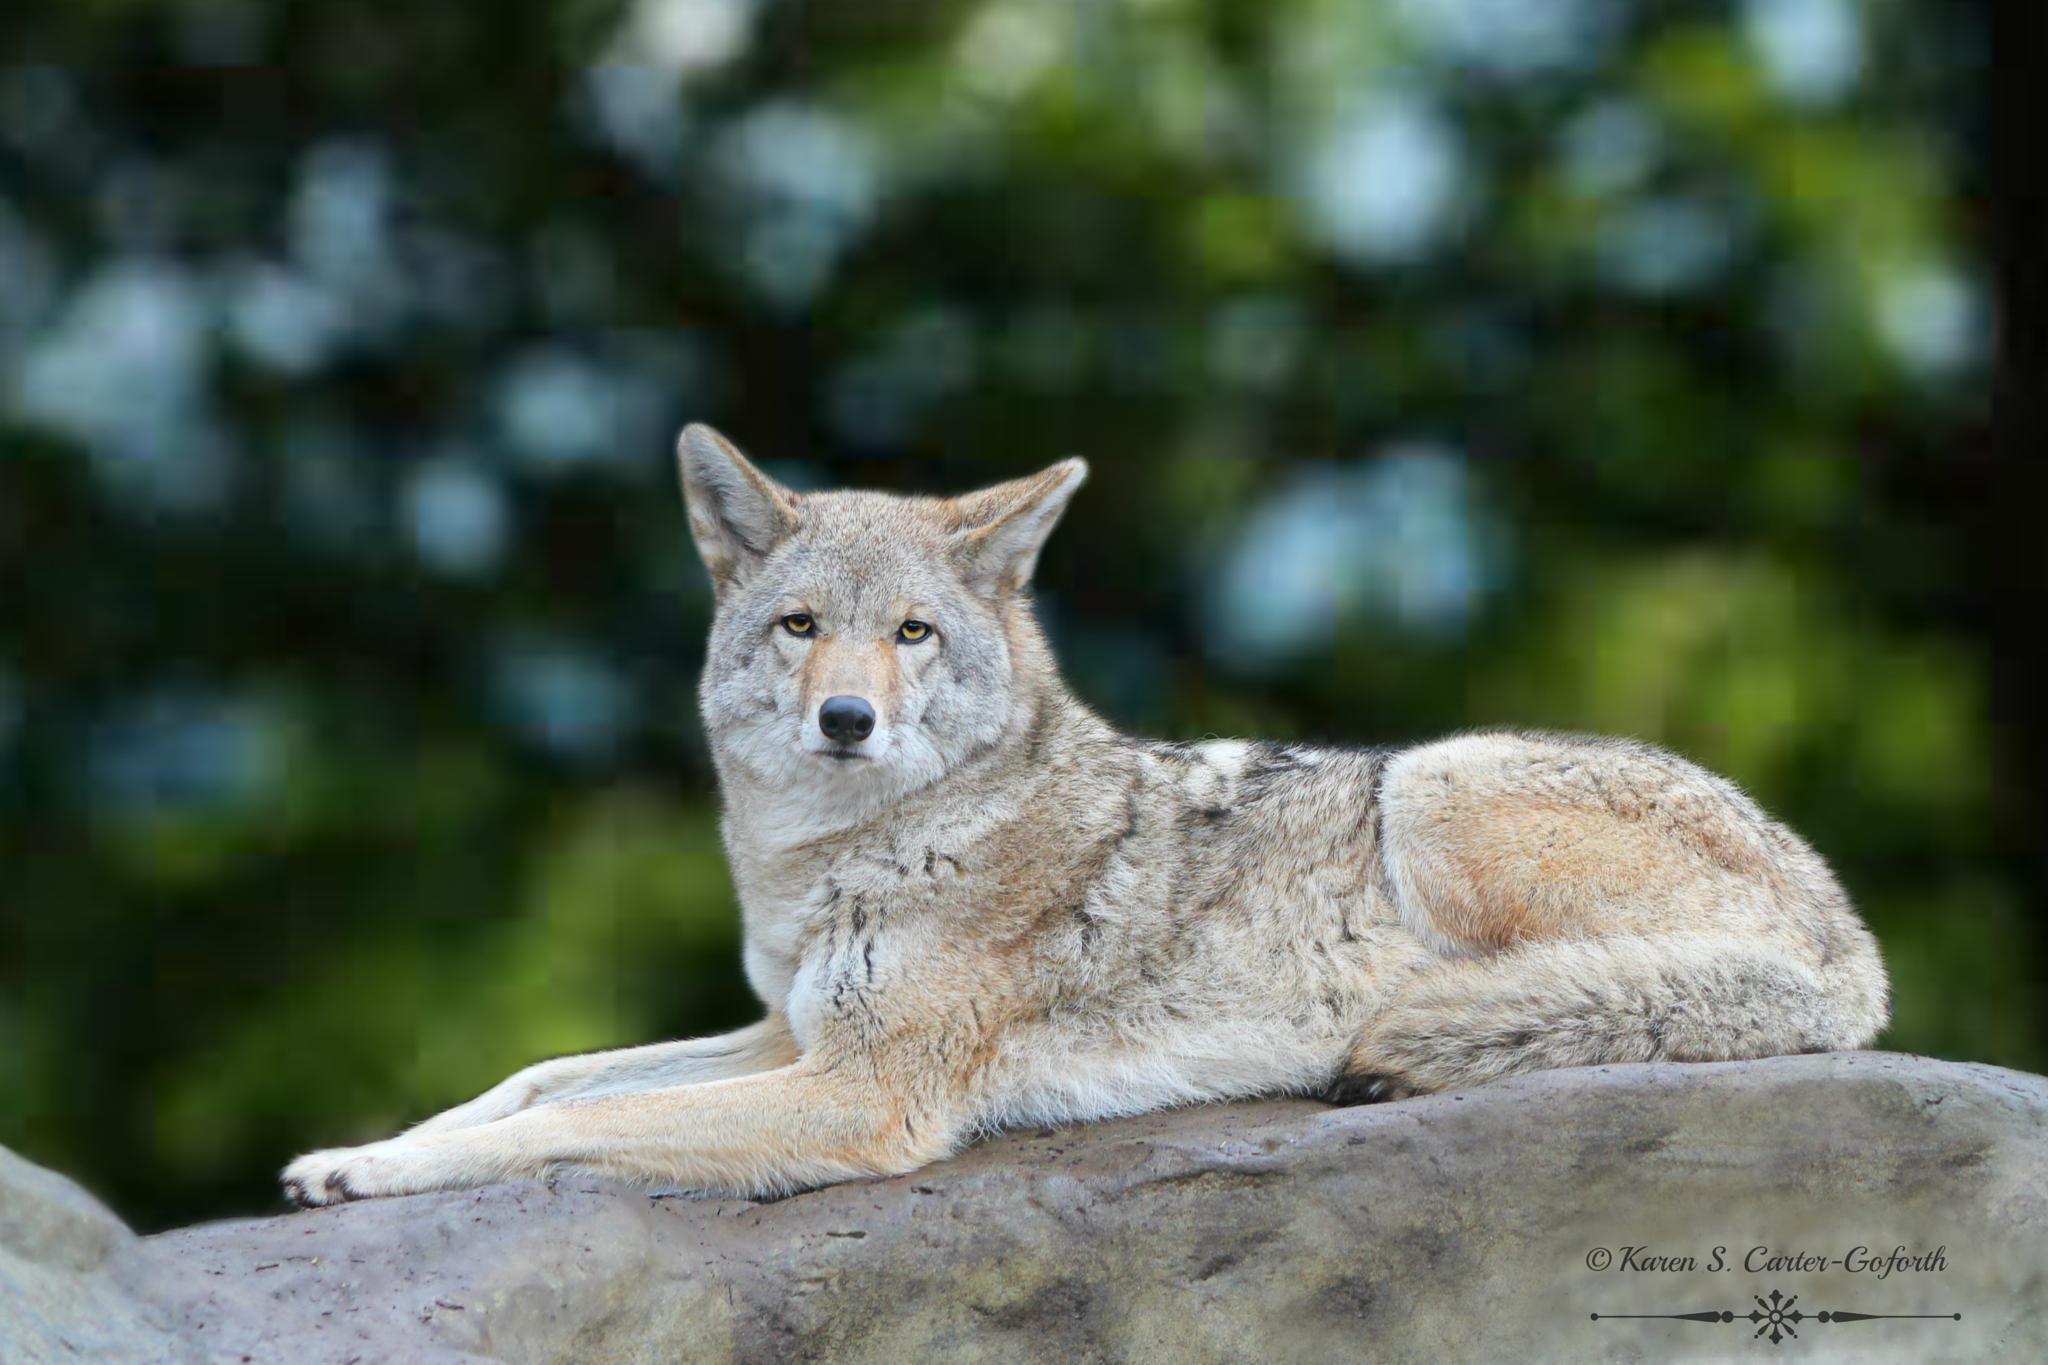 Coyote by Karen Carter-Goforth